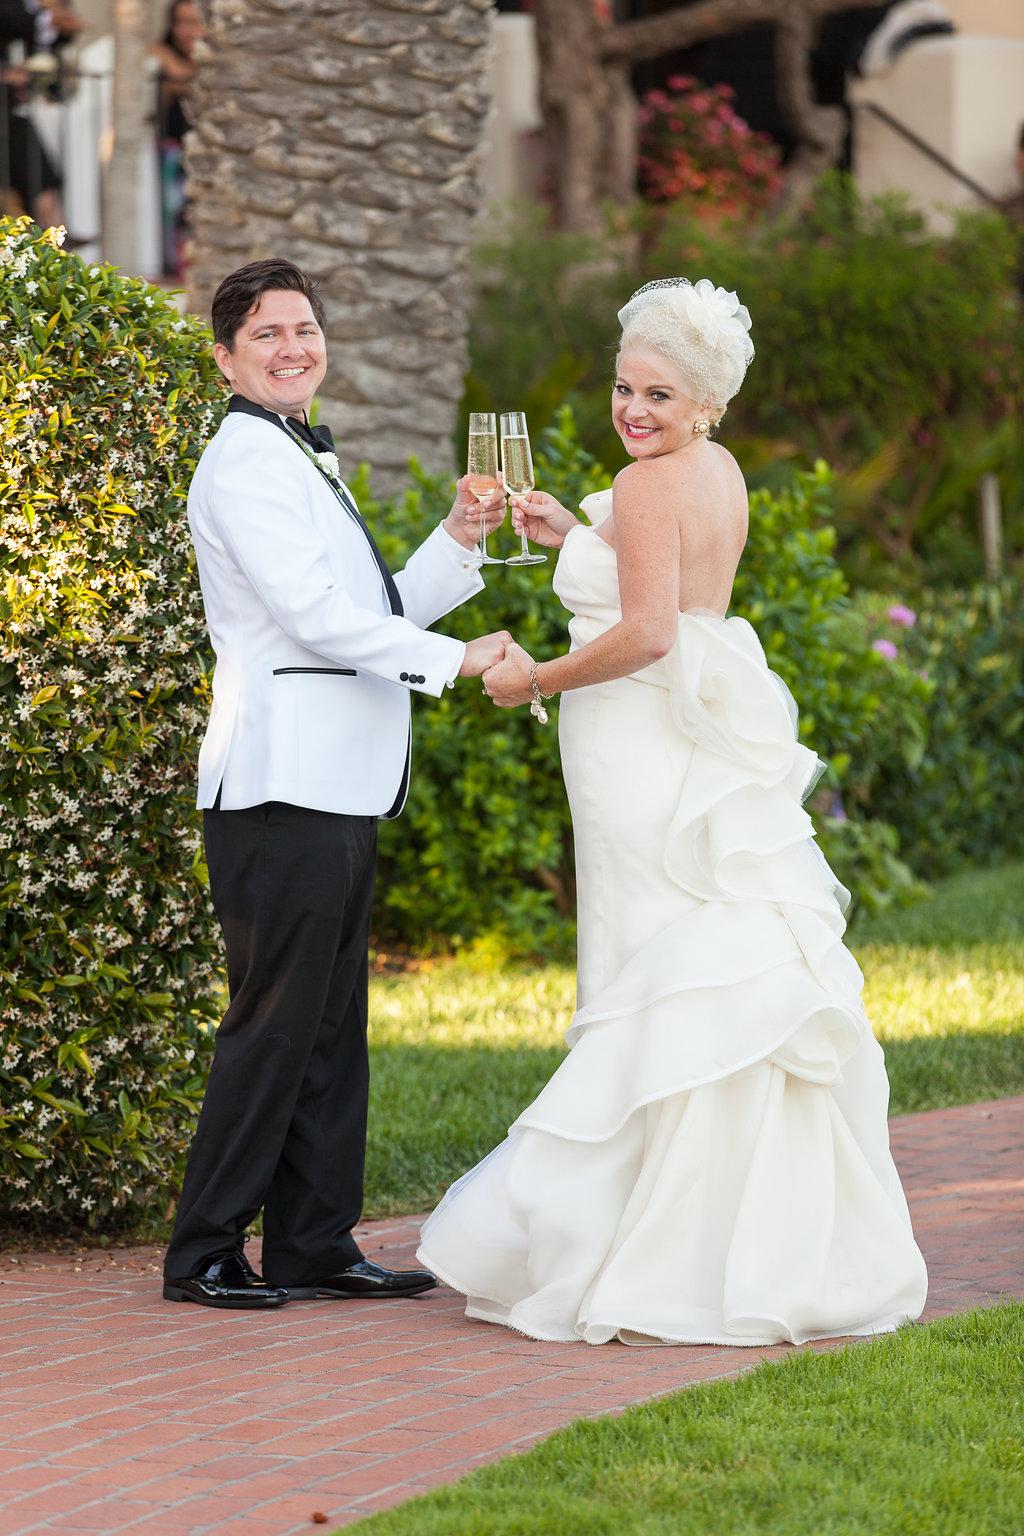 www.santabarbarawedding.com | Melissa Musgrove Photography | Four Seasons Resort The Biltmore | Bride and Groom | Toast